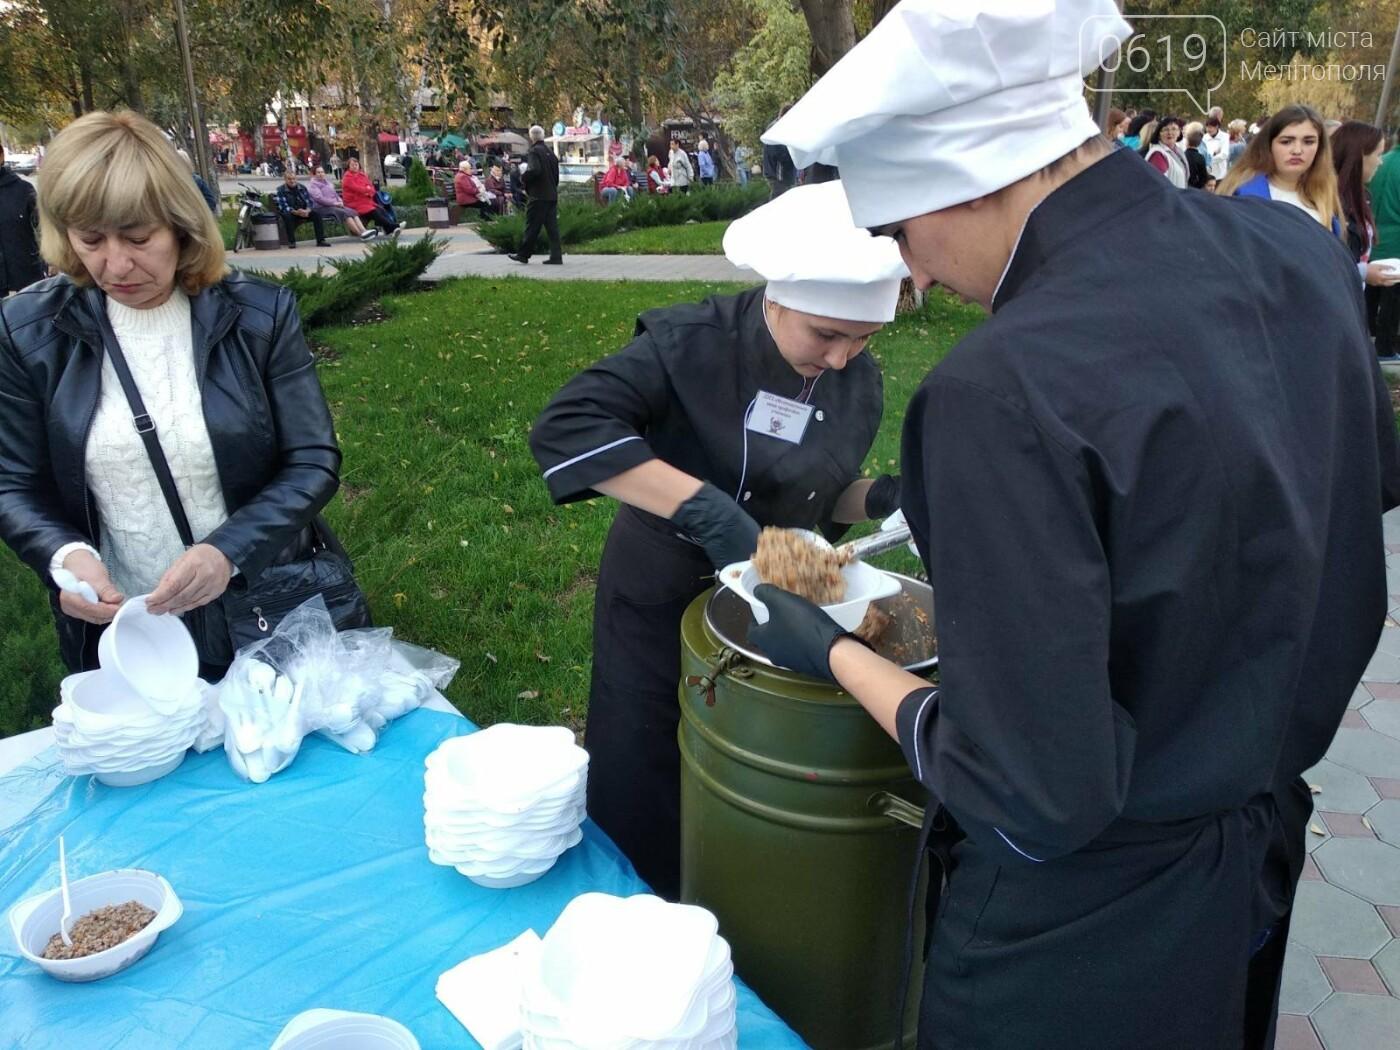 Жители микрорайона отметили День освобождения Мелитополя, - ФОТО , фото-7